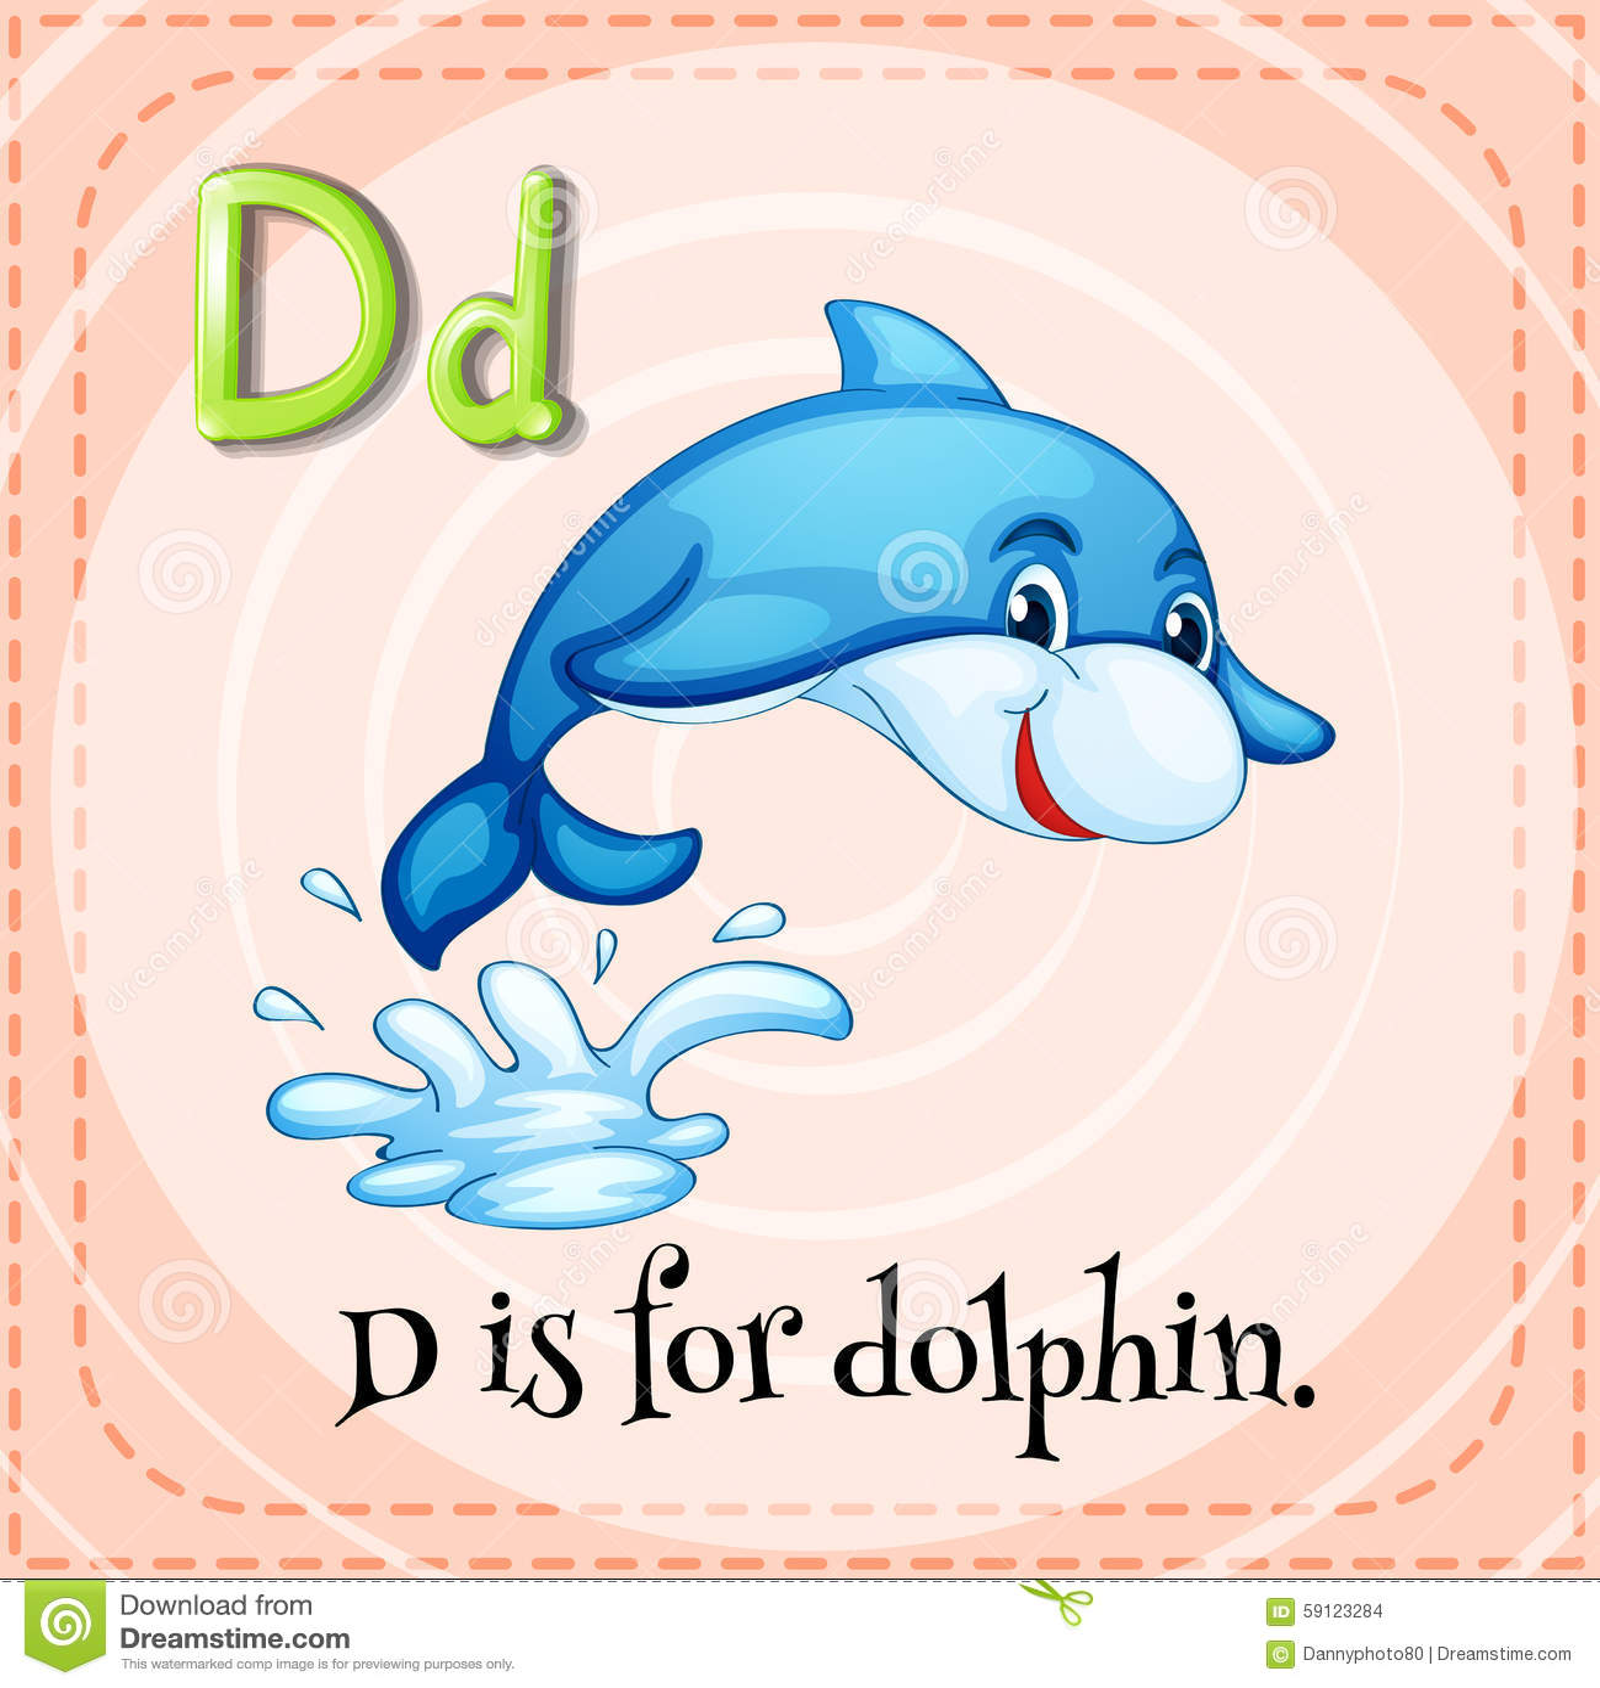 Stock Illustration Flashcard Letter D Dolphin Illustration Image59123284 on Alphabet Flash Cards